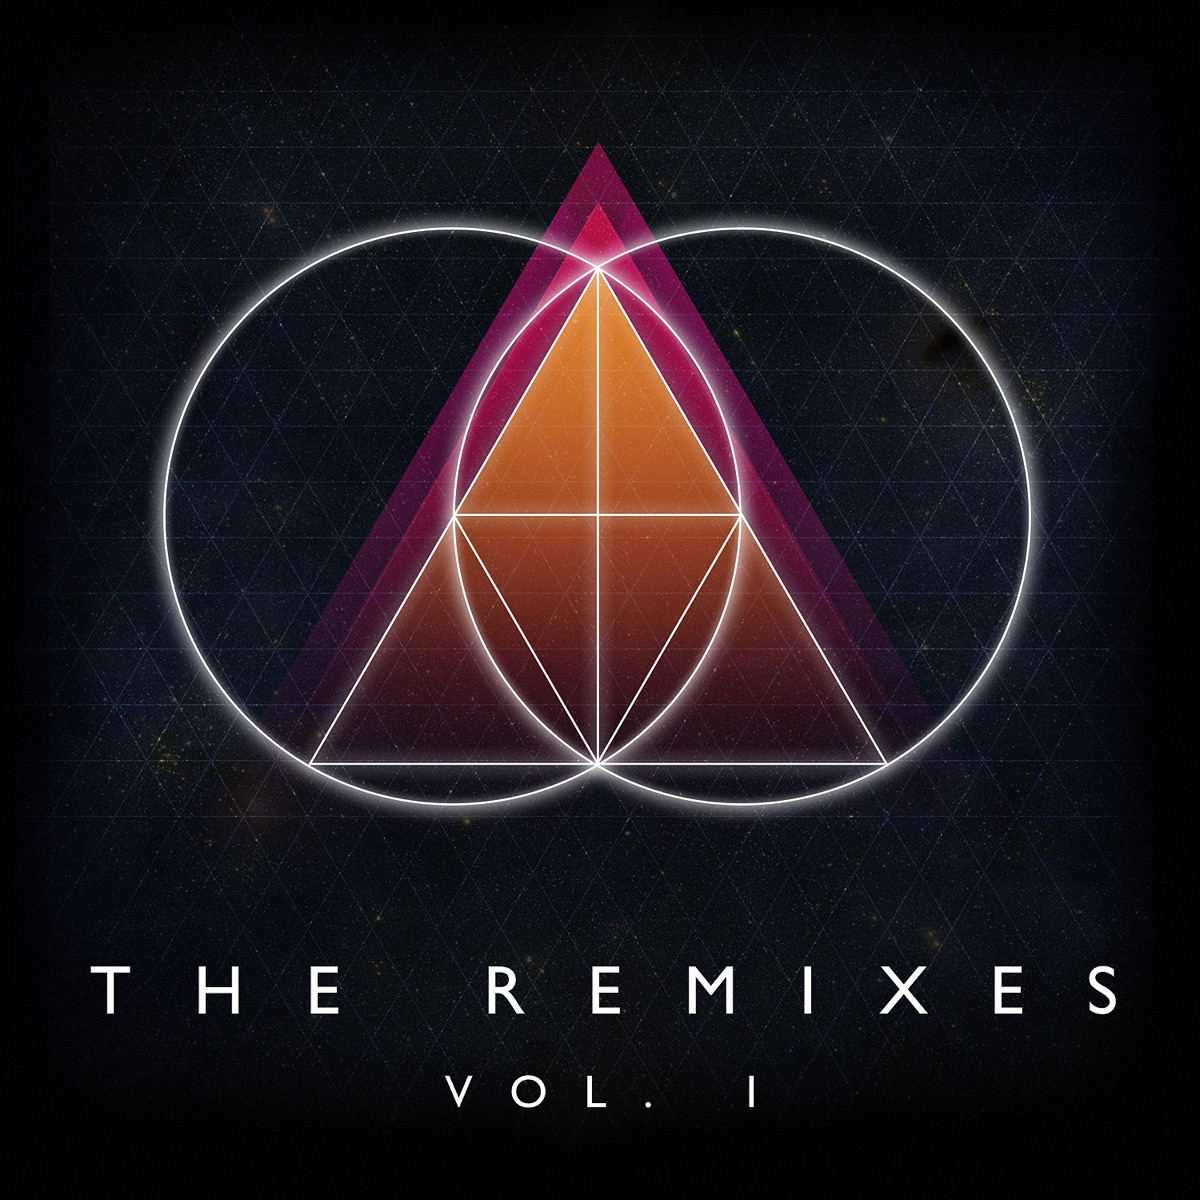 Drink the Sea Remixes Vol 1 The Glitch Mob CD cover